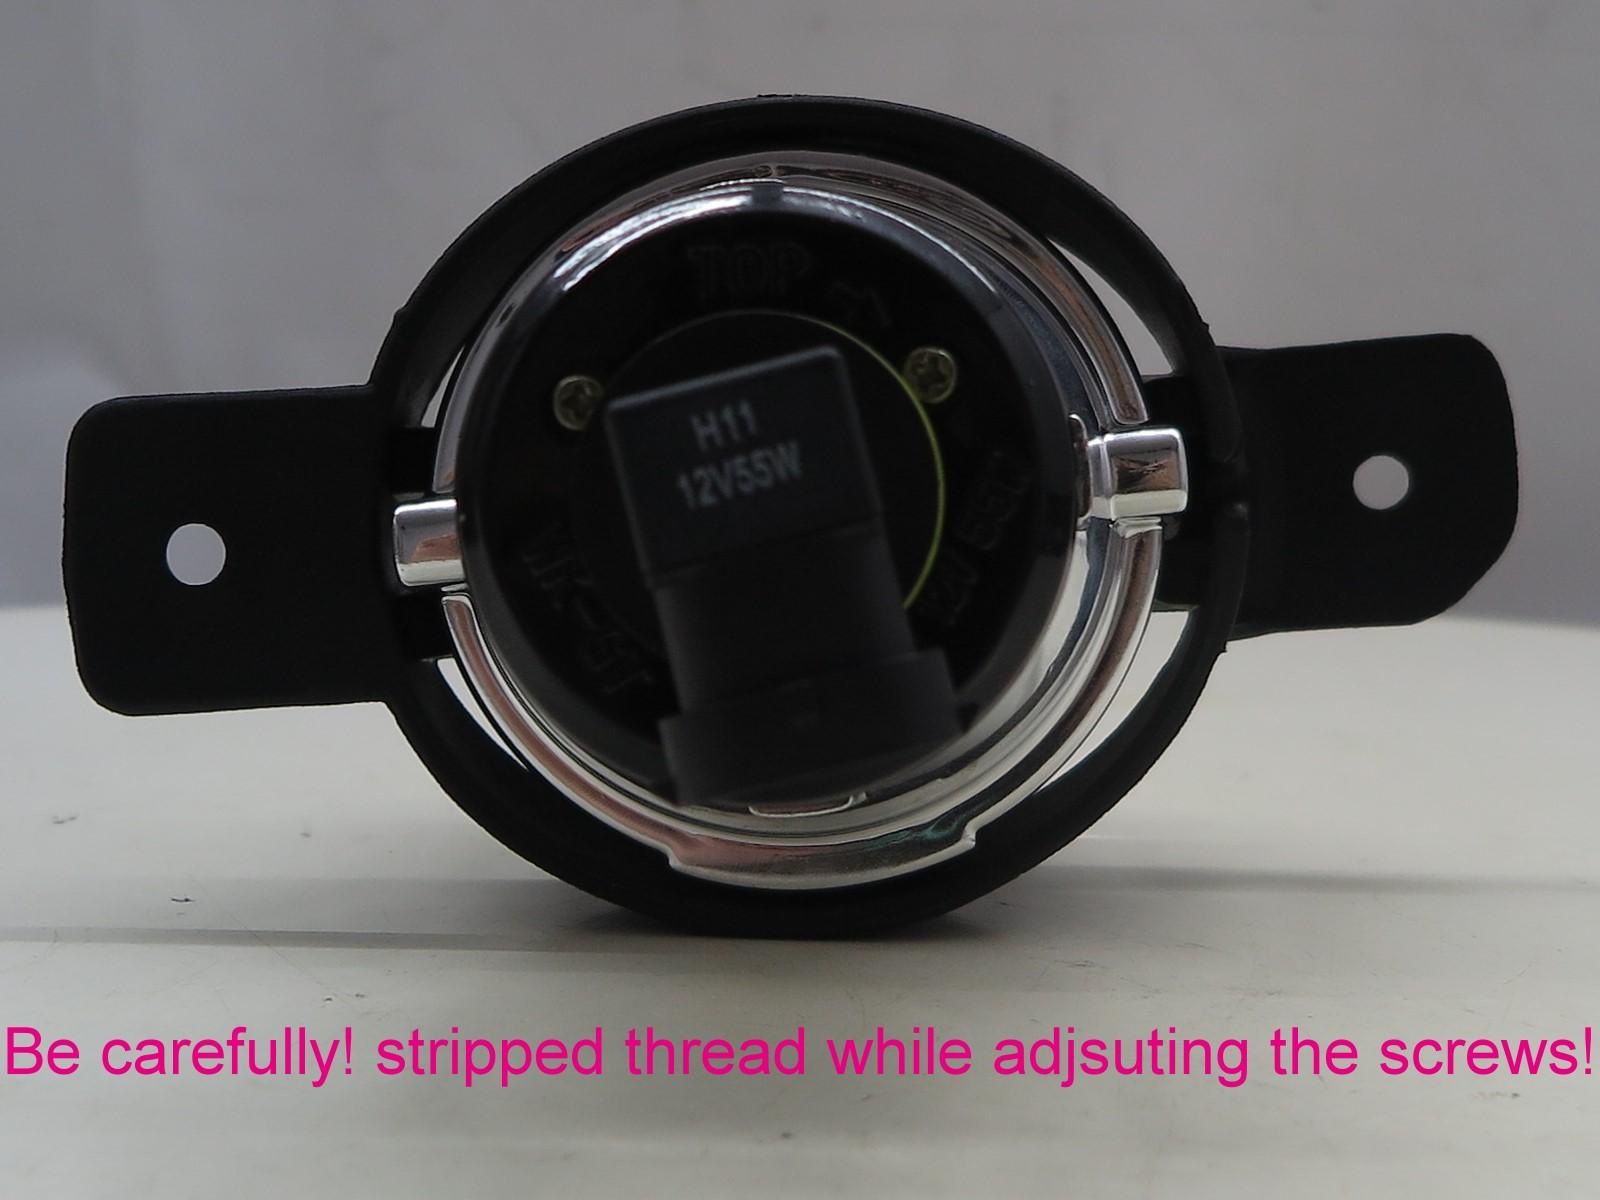 thumbnail 3 - Almera N16 MK2 2002-2006 Facelift 3D/4D/5D Projector Fog Light Black for NISSAN